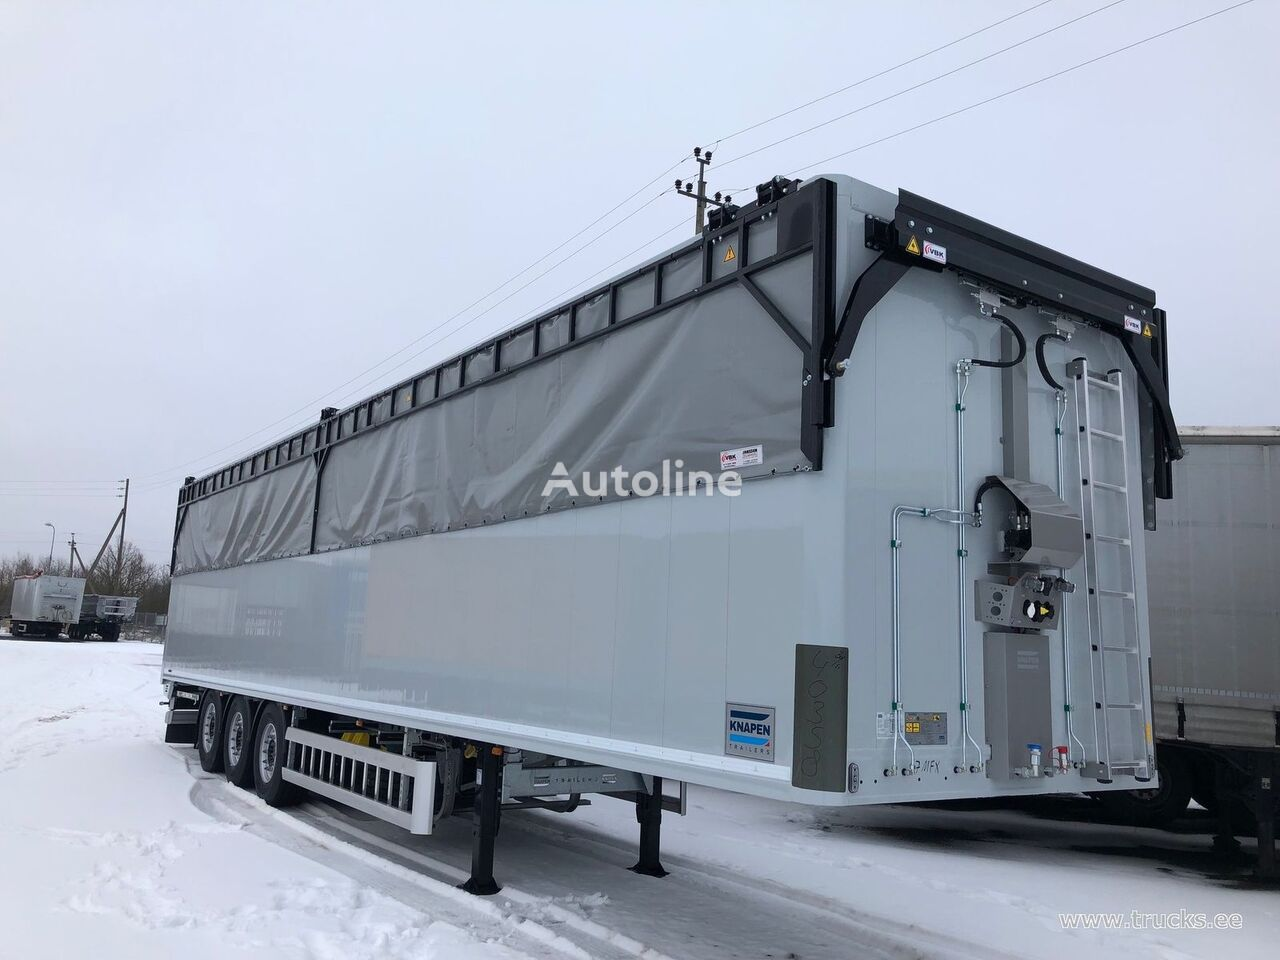 KNAPEN tipper semi-trailer